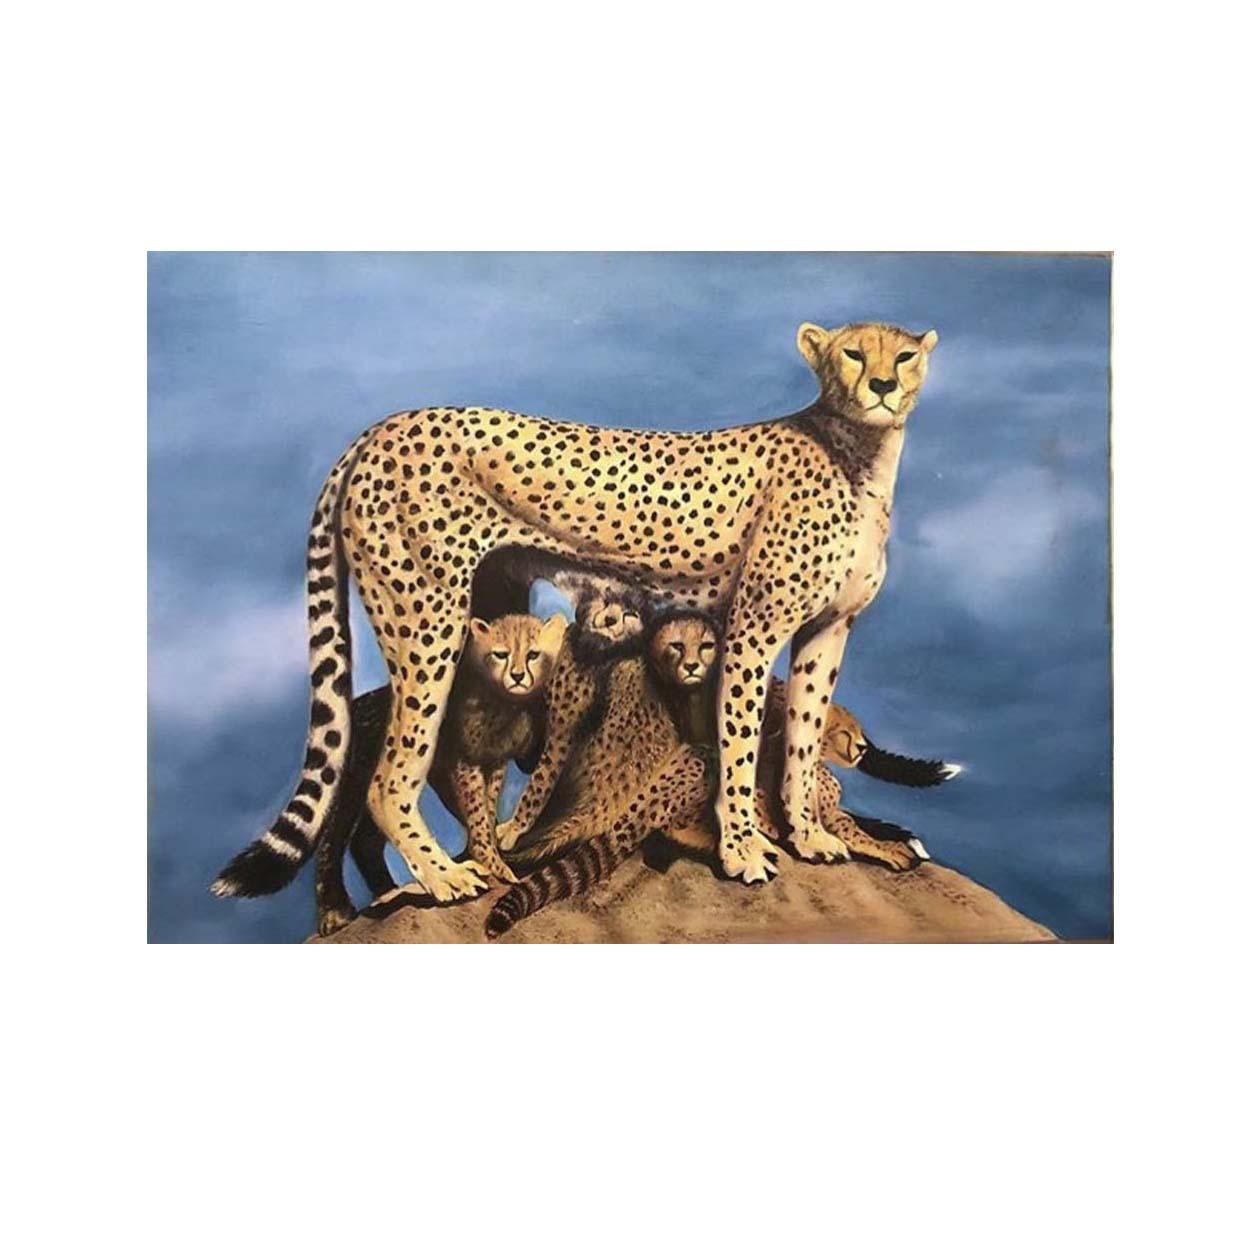 تابلو نقاشی رنگ روغن طرح مادر  کد 11001